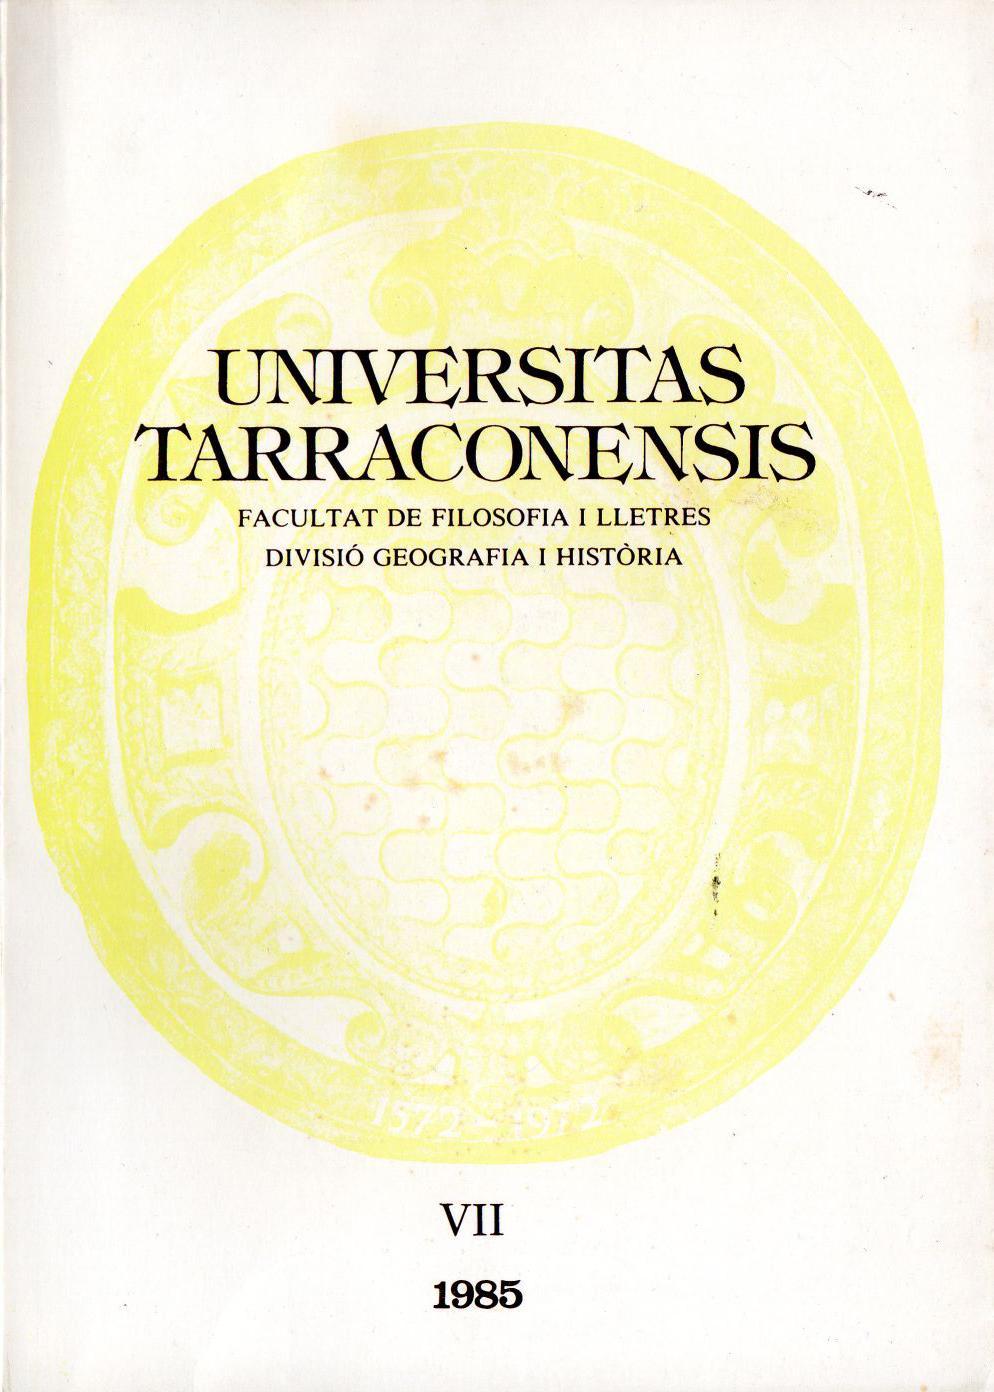 Universitas Tarraconensis. Revista de Geografia, Història i Filosofia. 1985